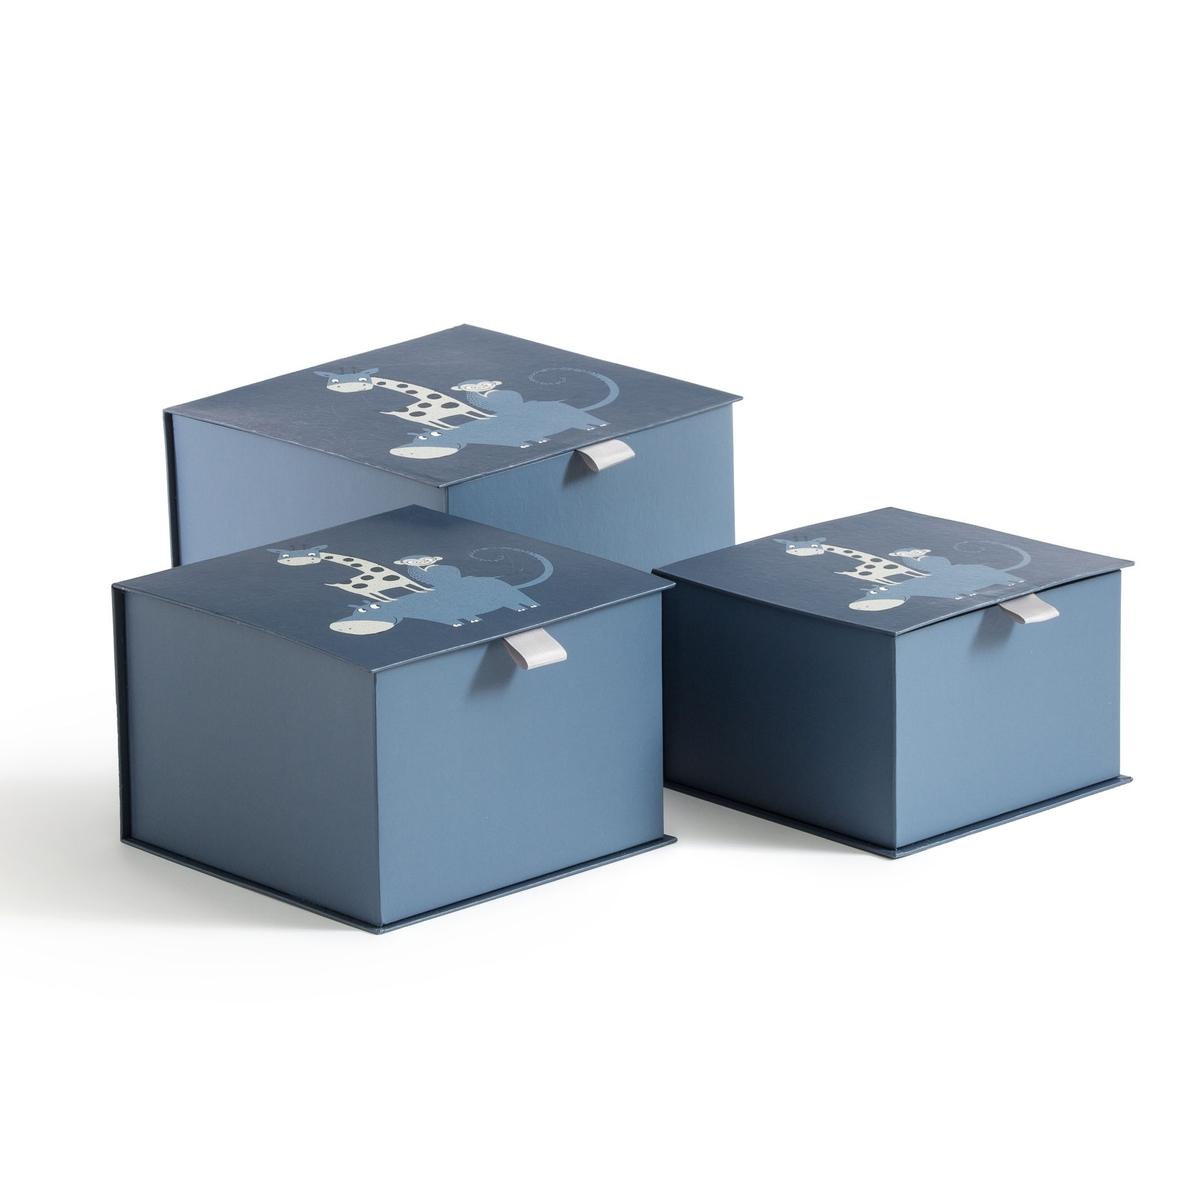 Комплект из 3 коробок, Nimali LaRedoute La Redoute единый размер синий кардиган la redoute удлиненный из трикотажа 3 года 94 см синий